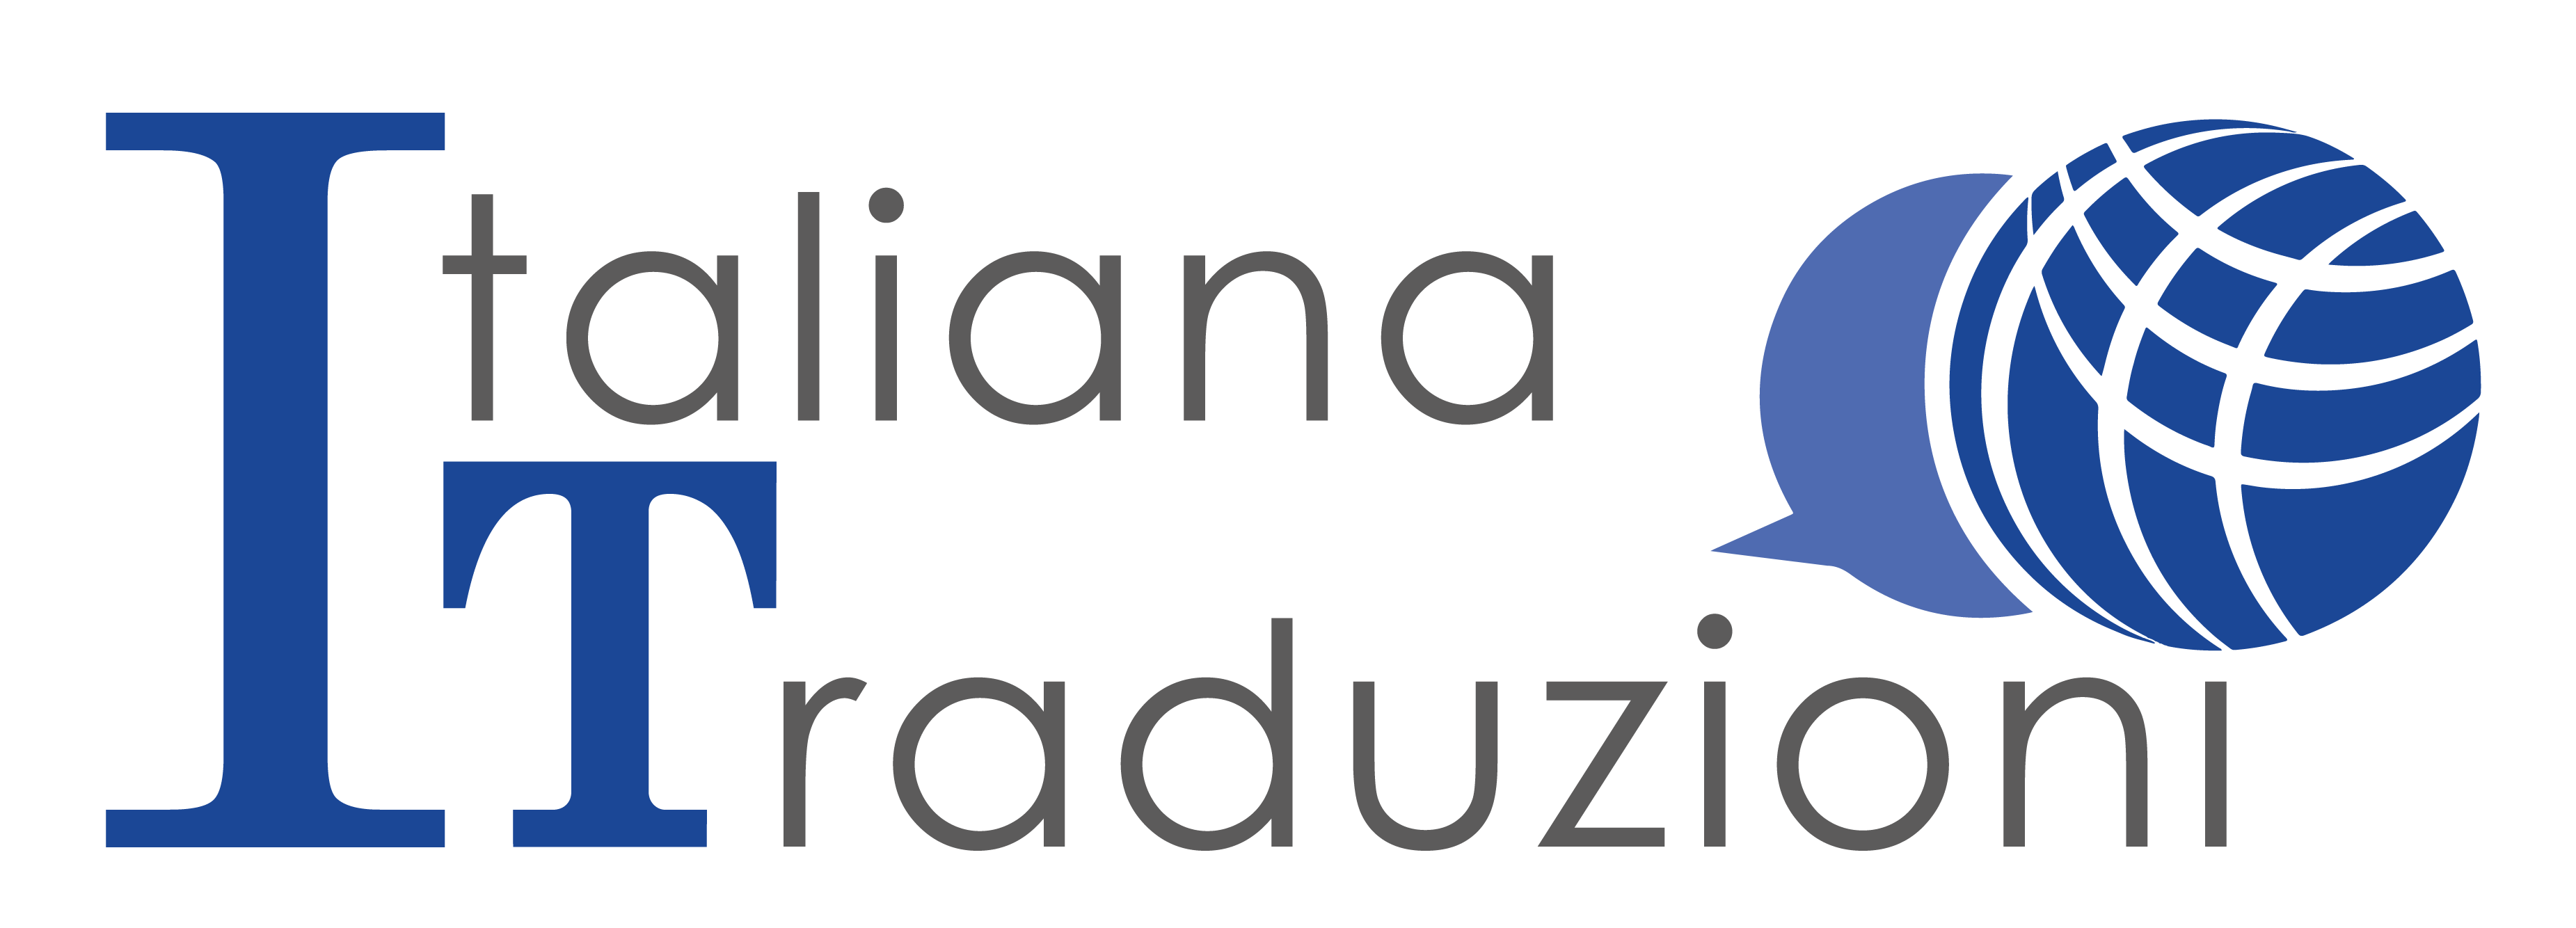 Traduzioni professionali certificate – Italiana Traduzioni